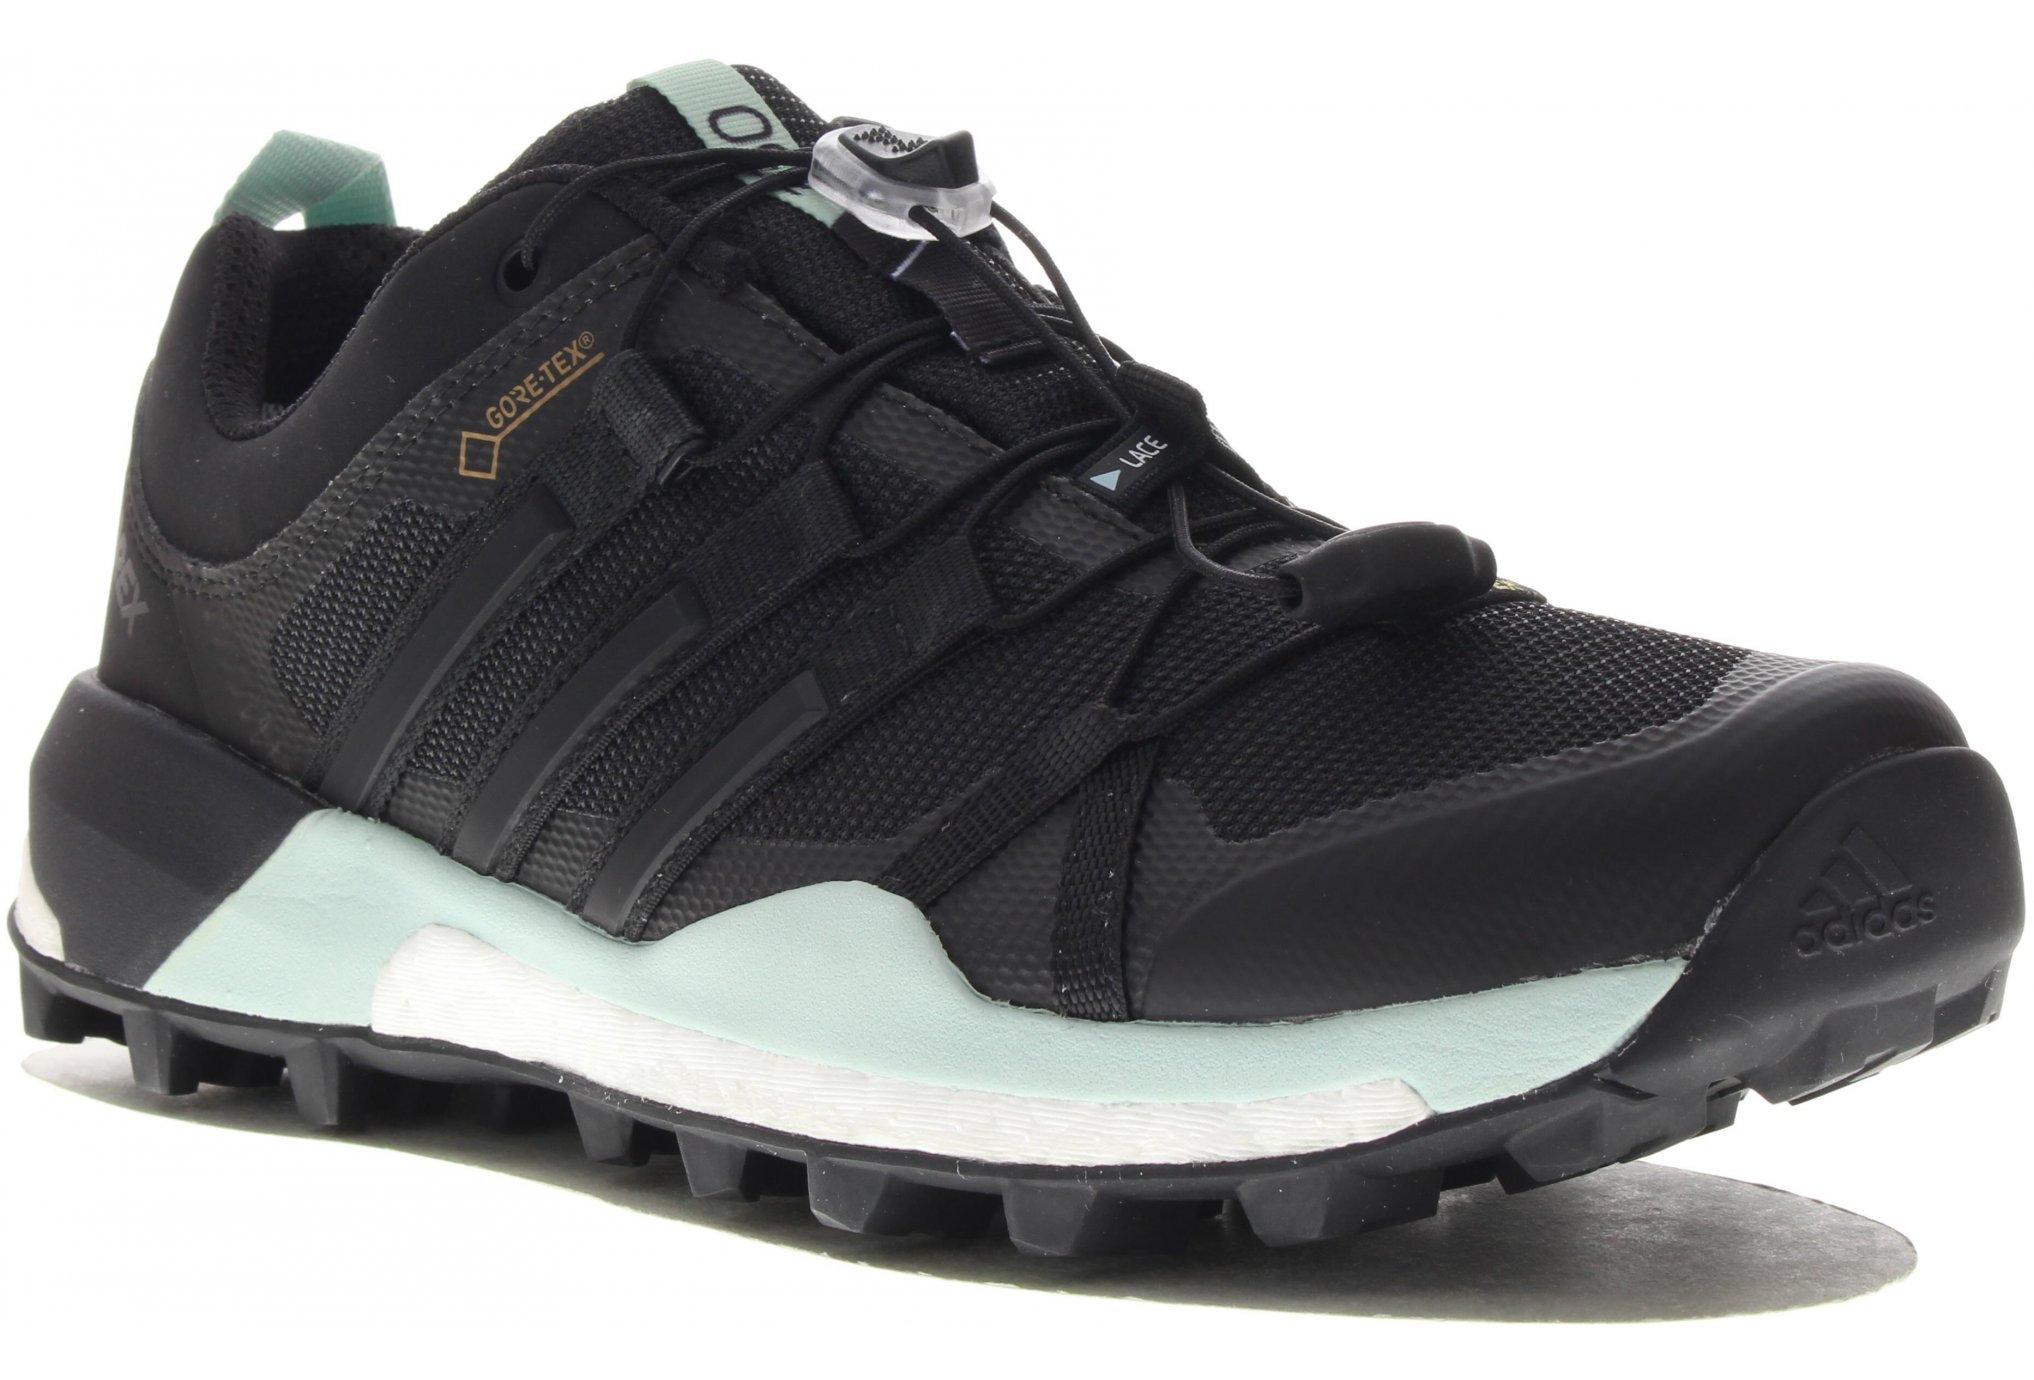 adidas Terrex Skychaser Gore-Tex W Diététique Chaussures femme